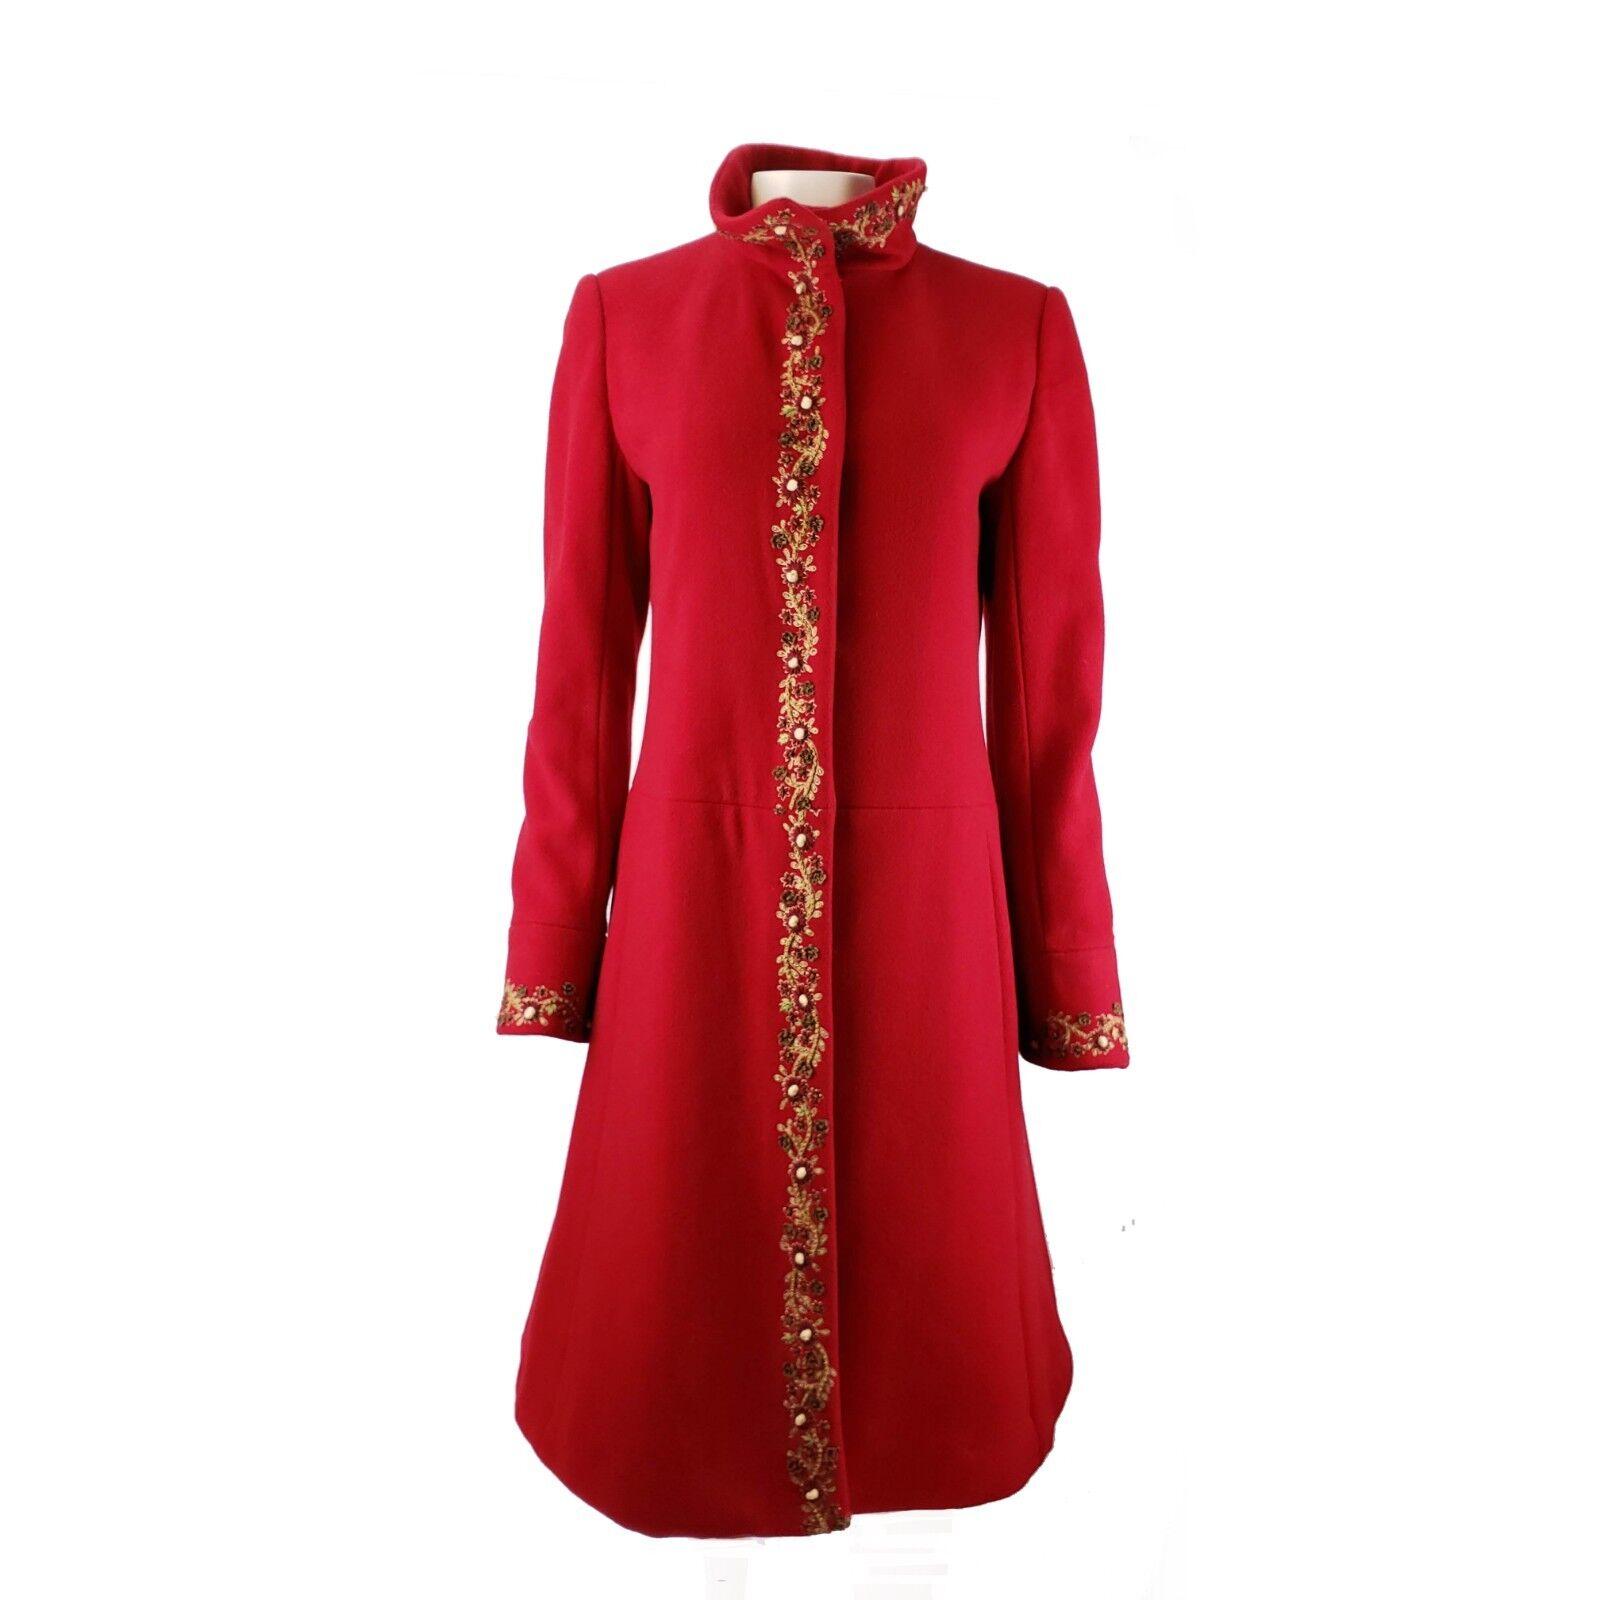 Oscar De La Renta Red Wool Cashmere Blend Embroidered Coat Womens 4 Funnel Neck